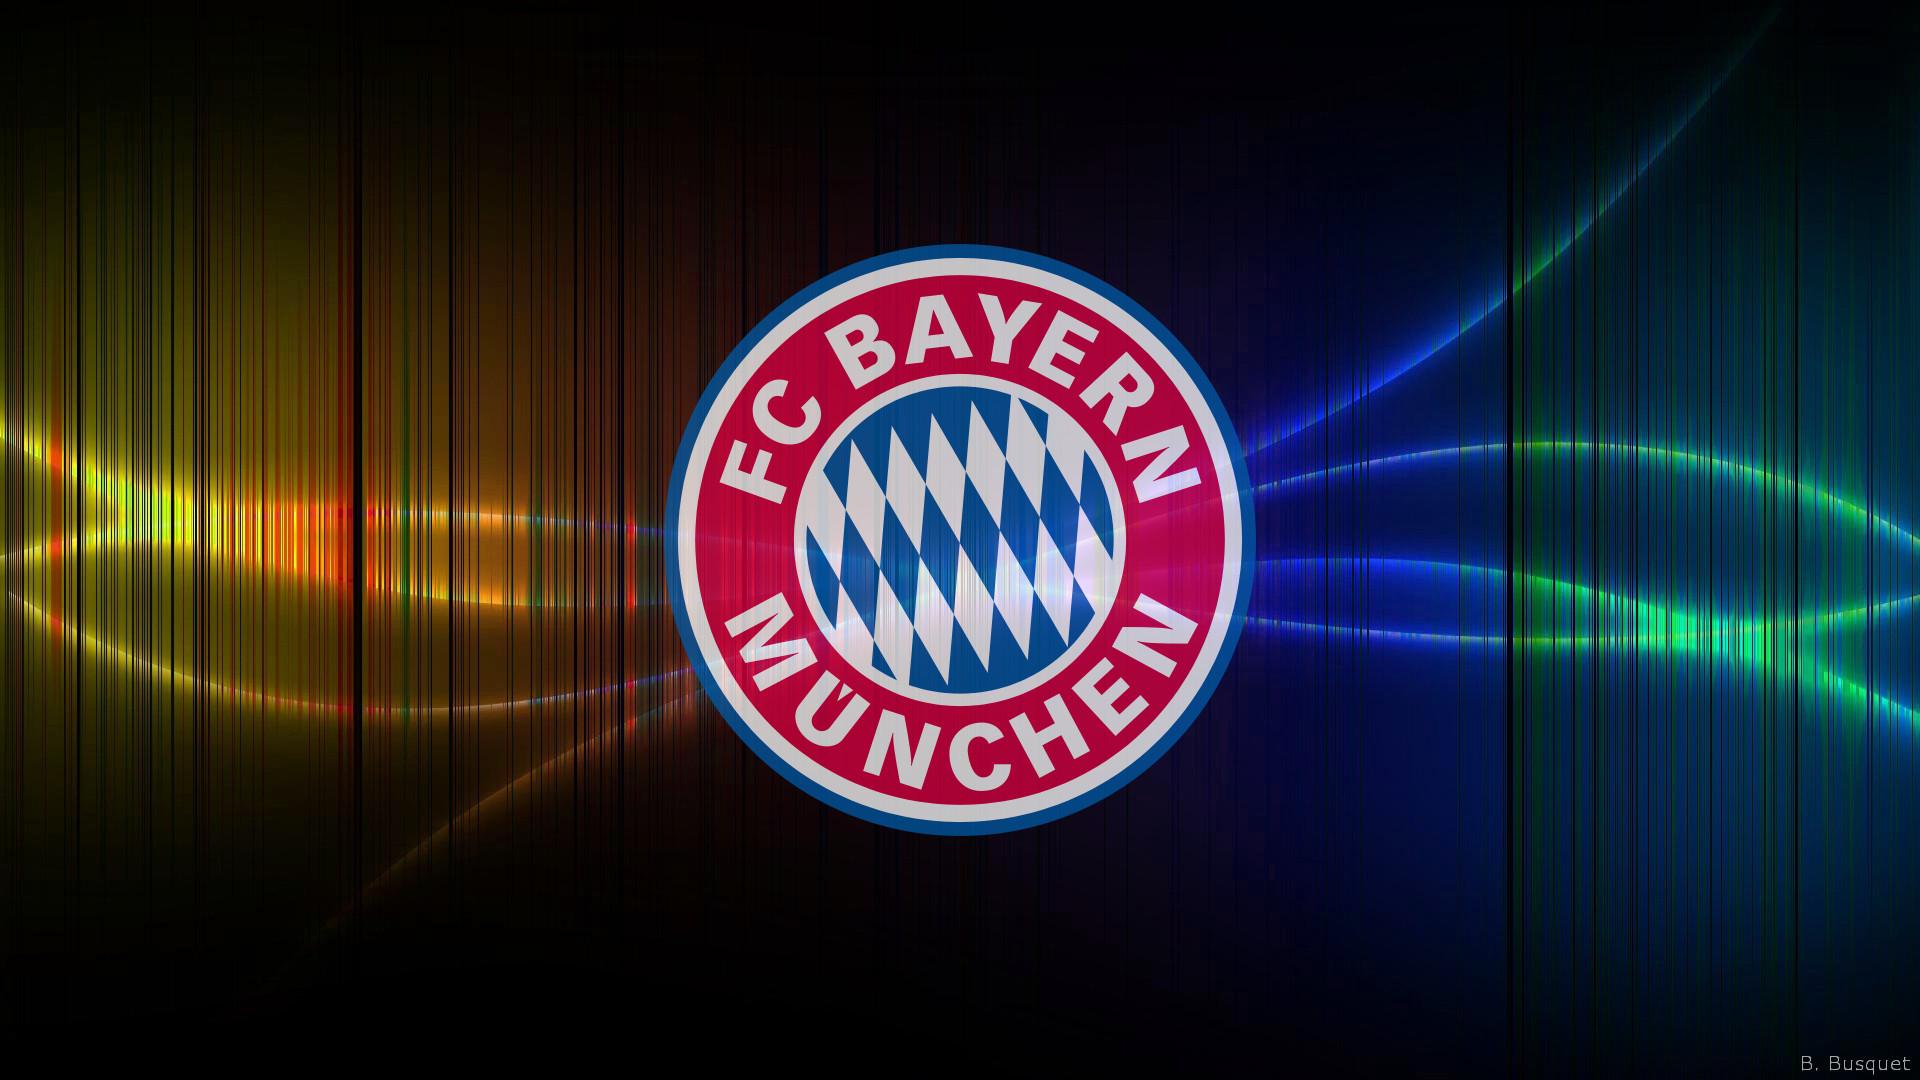 16 Luxury Pubg Wallpaper Iphone 6: Bayern Munich Wallpaper